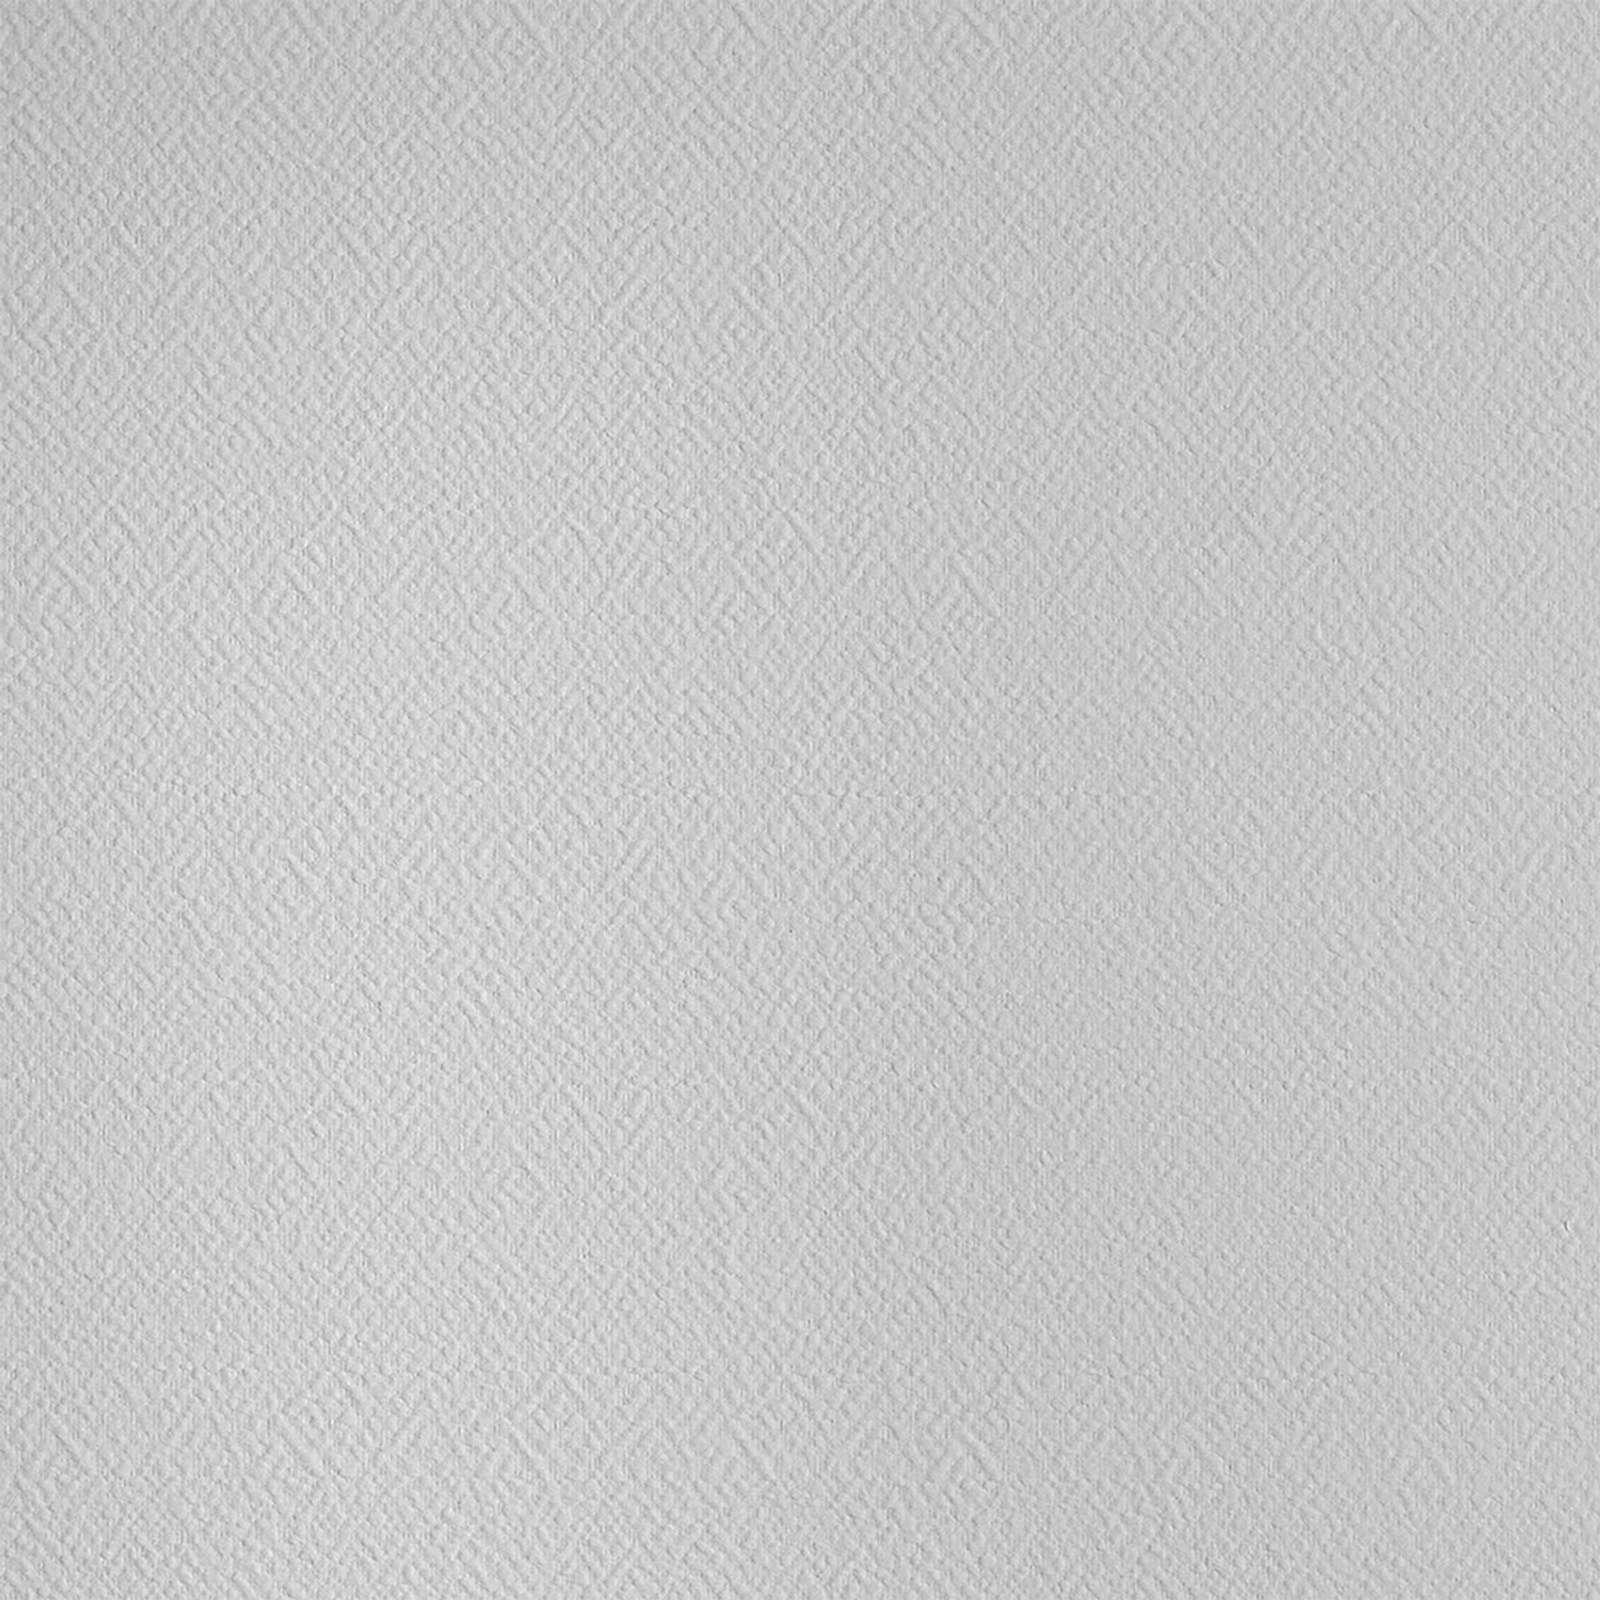 Стеклообои Wellton WO115 Креп (1мх25м)